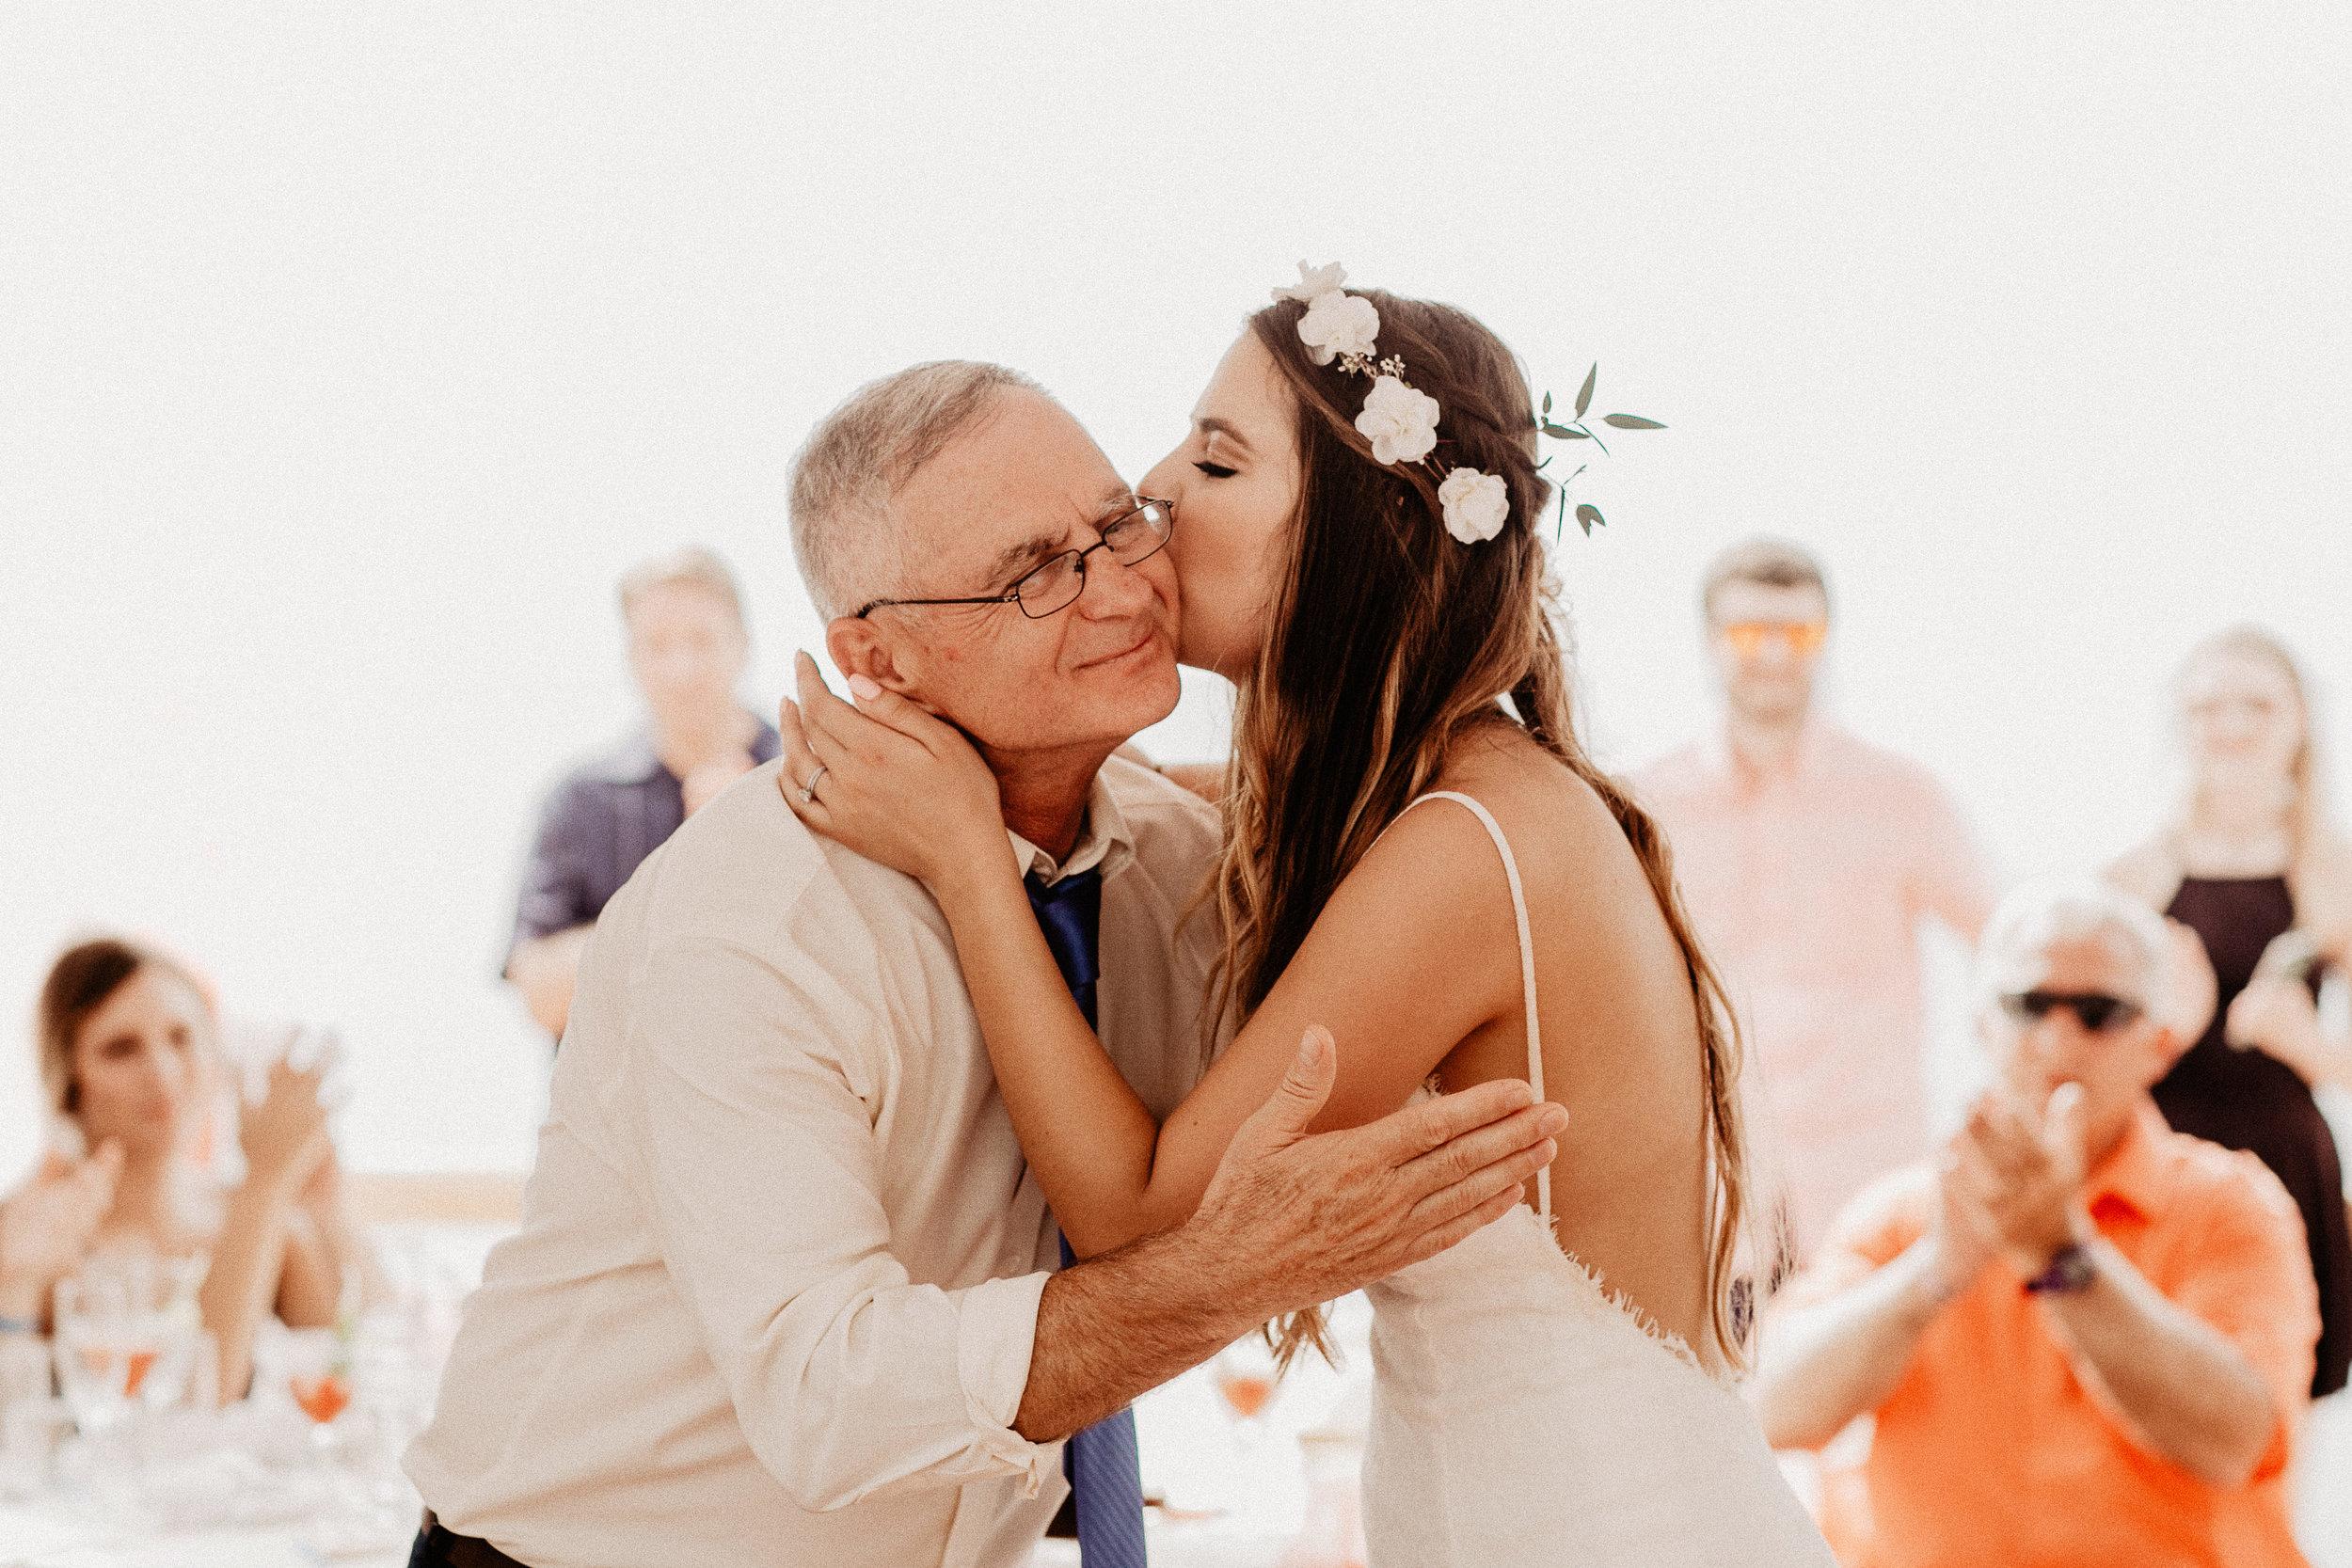 alfonso_flores_destination_wedding_photography_puerto_vallarta_hotel_barcelo_vallarta_cuttler_amela-482.JPG